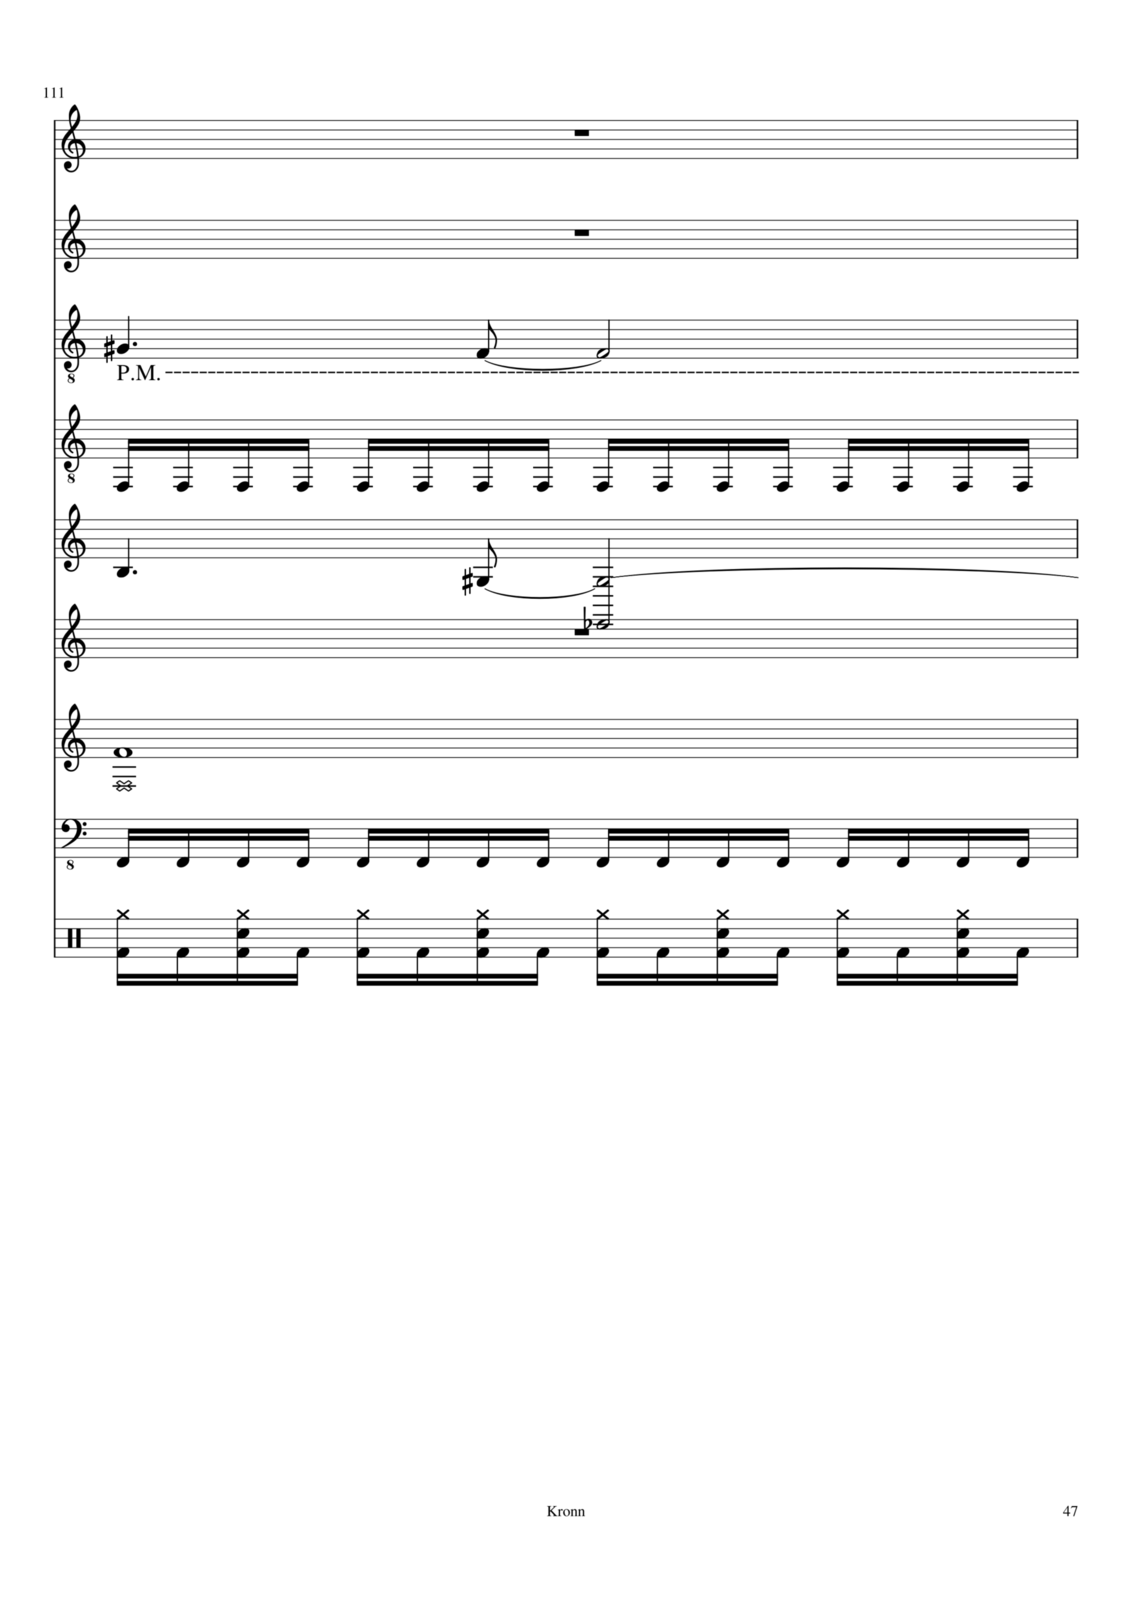 Ispoved Pervogo Boga slide, Image 47